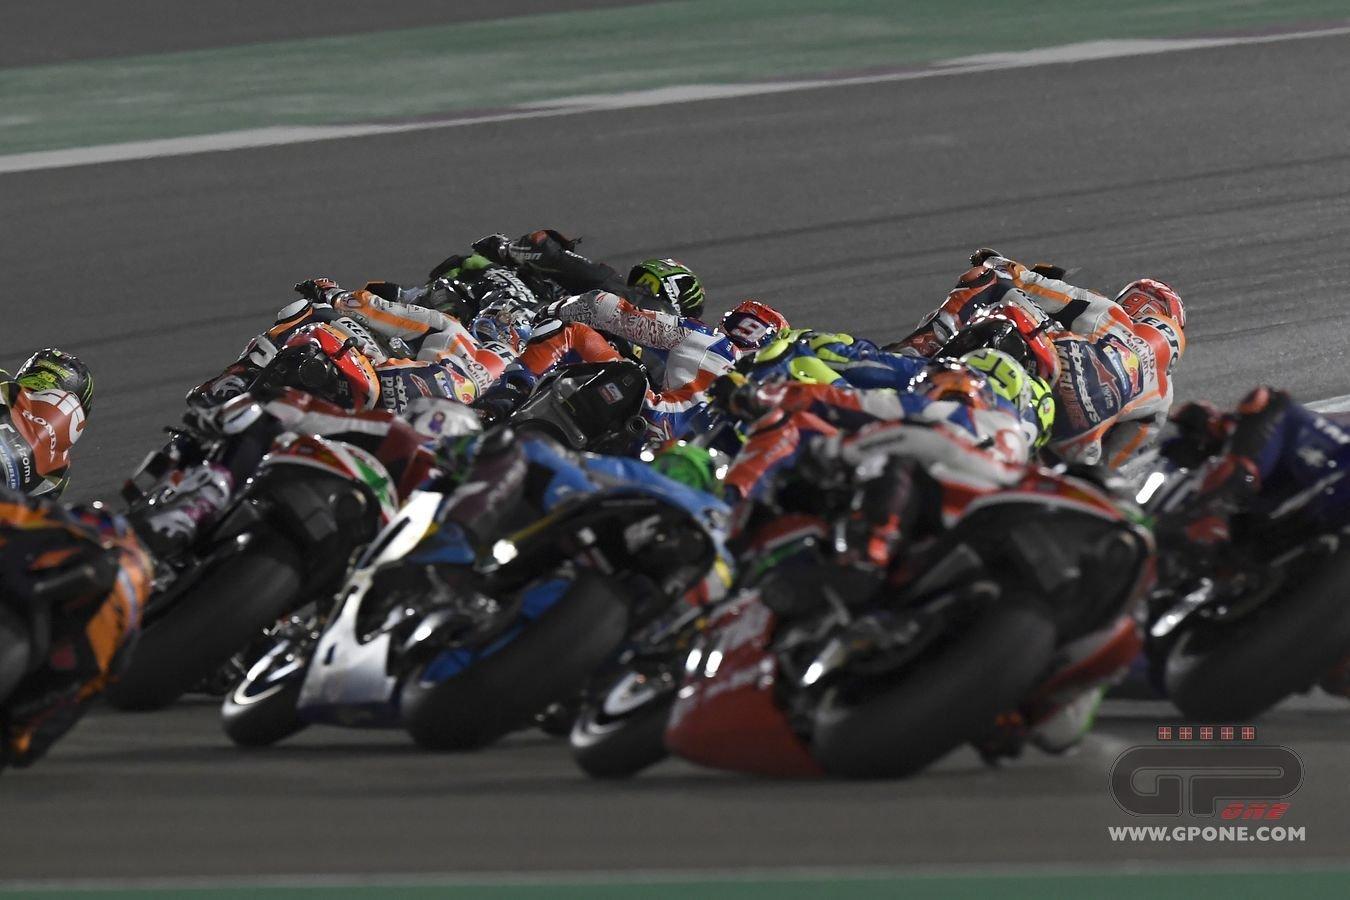 MotoGP, GP del Qatar, Race | GPone.com